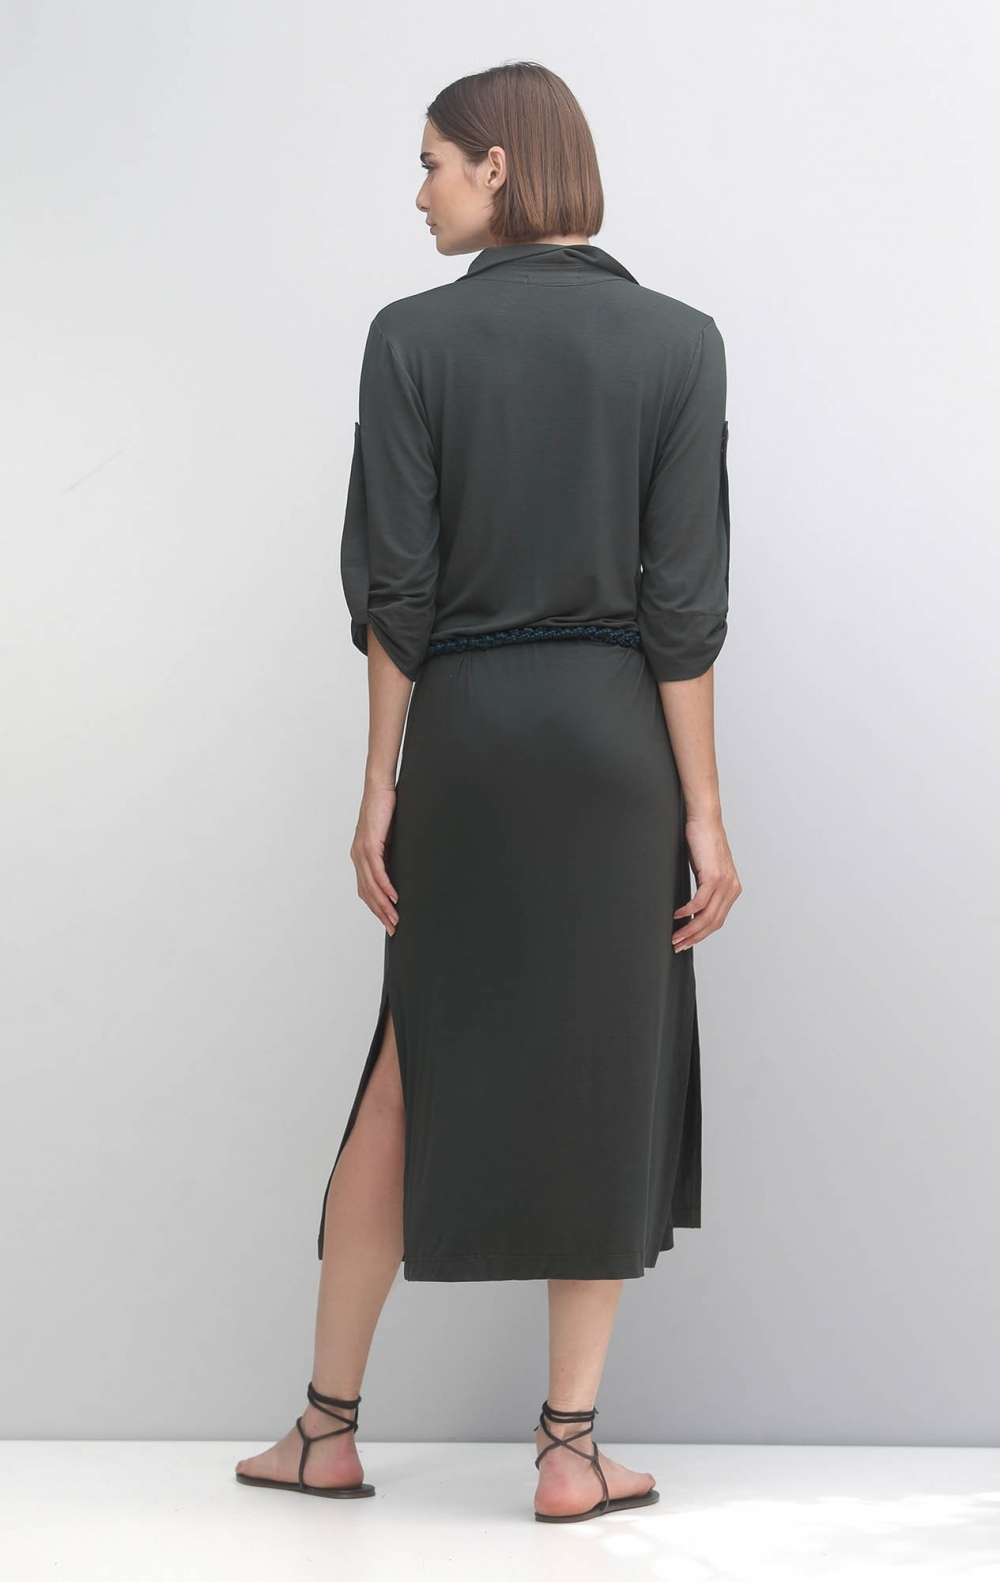 Vestido Malha Gola Polo Verde Musgo - Foto 2